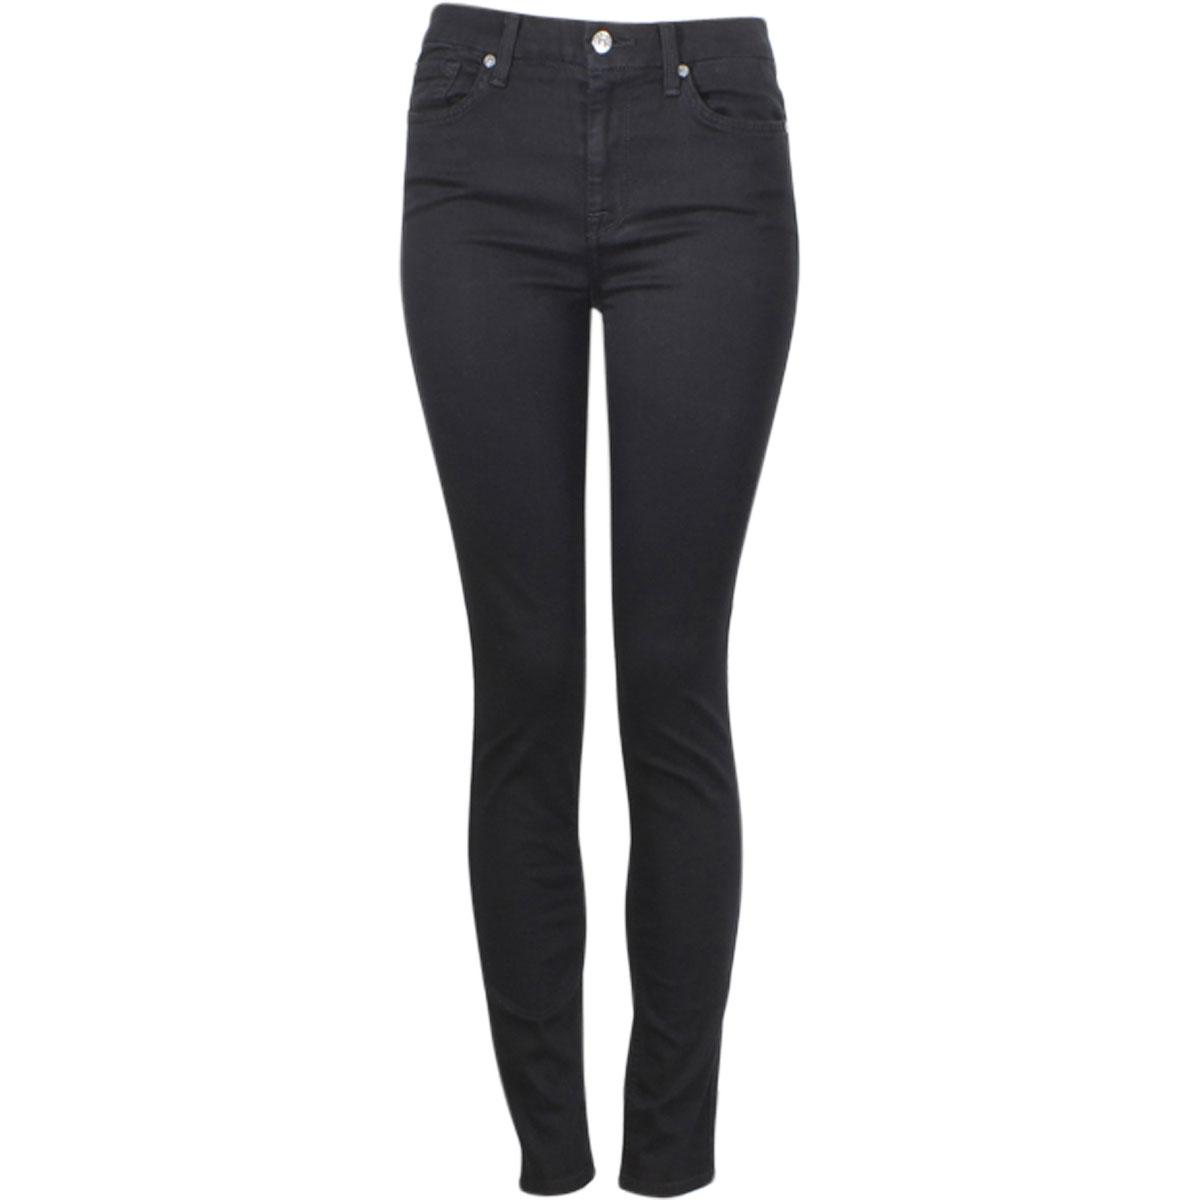 Image of 7 For All Mankind Women's (B)Air Denim The High Waist Skinny Full Length Jeans - Black - 30 (9/10)